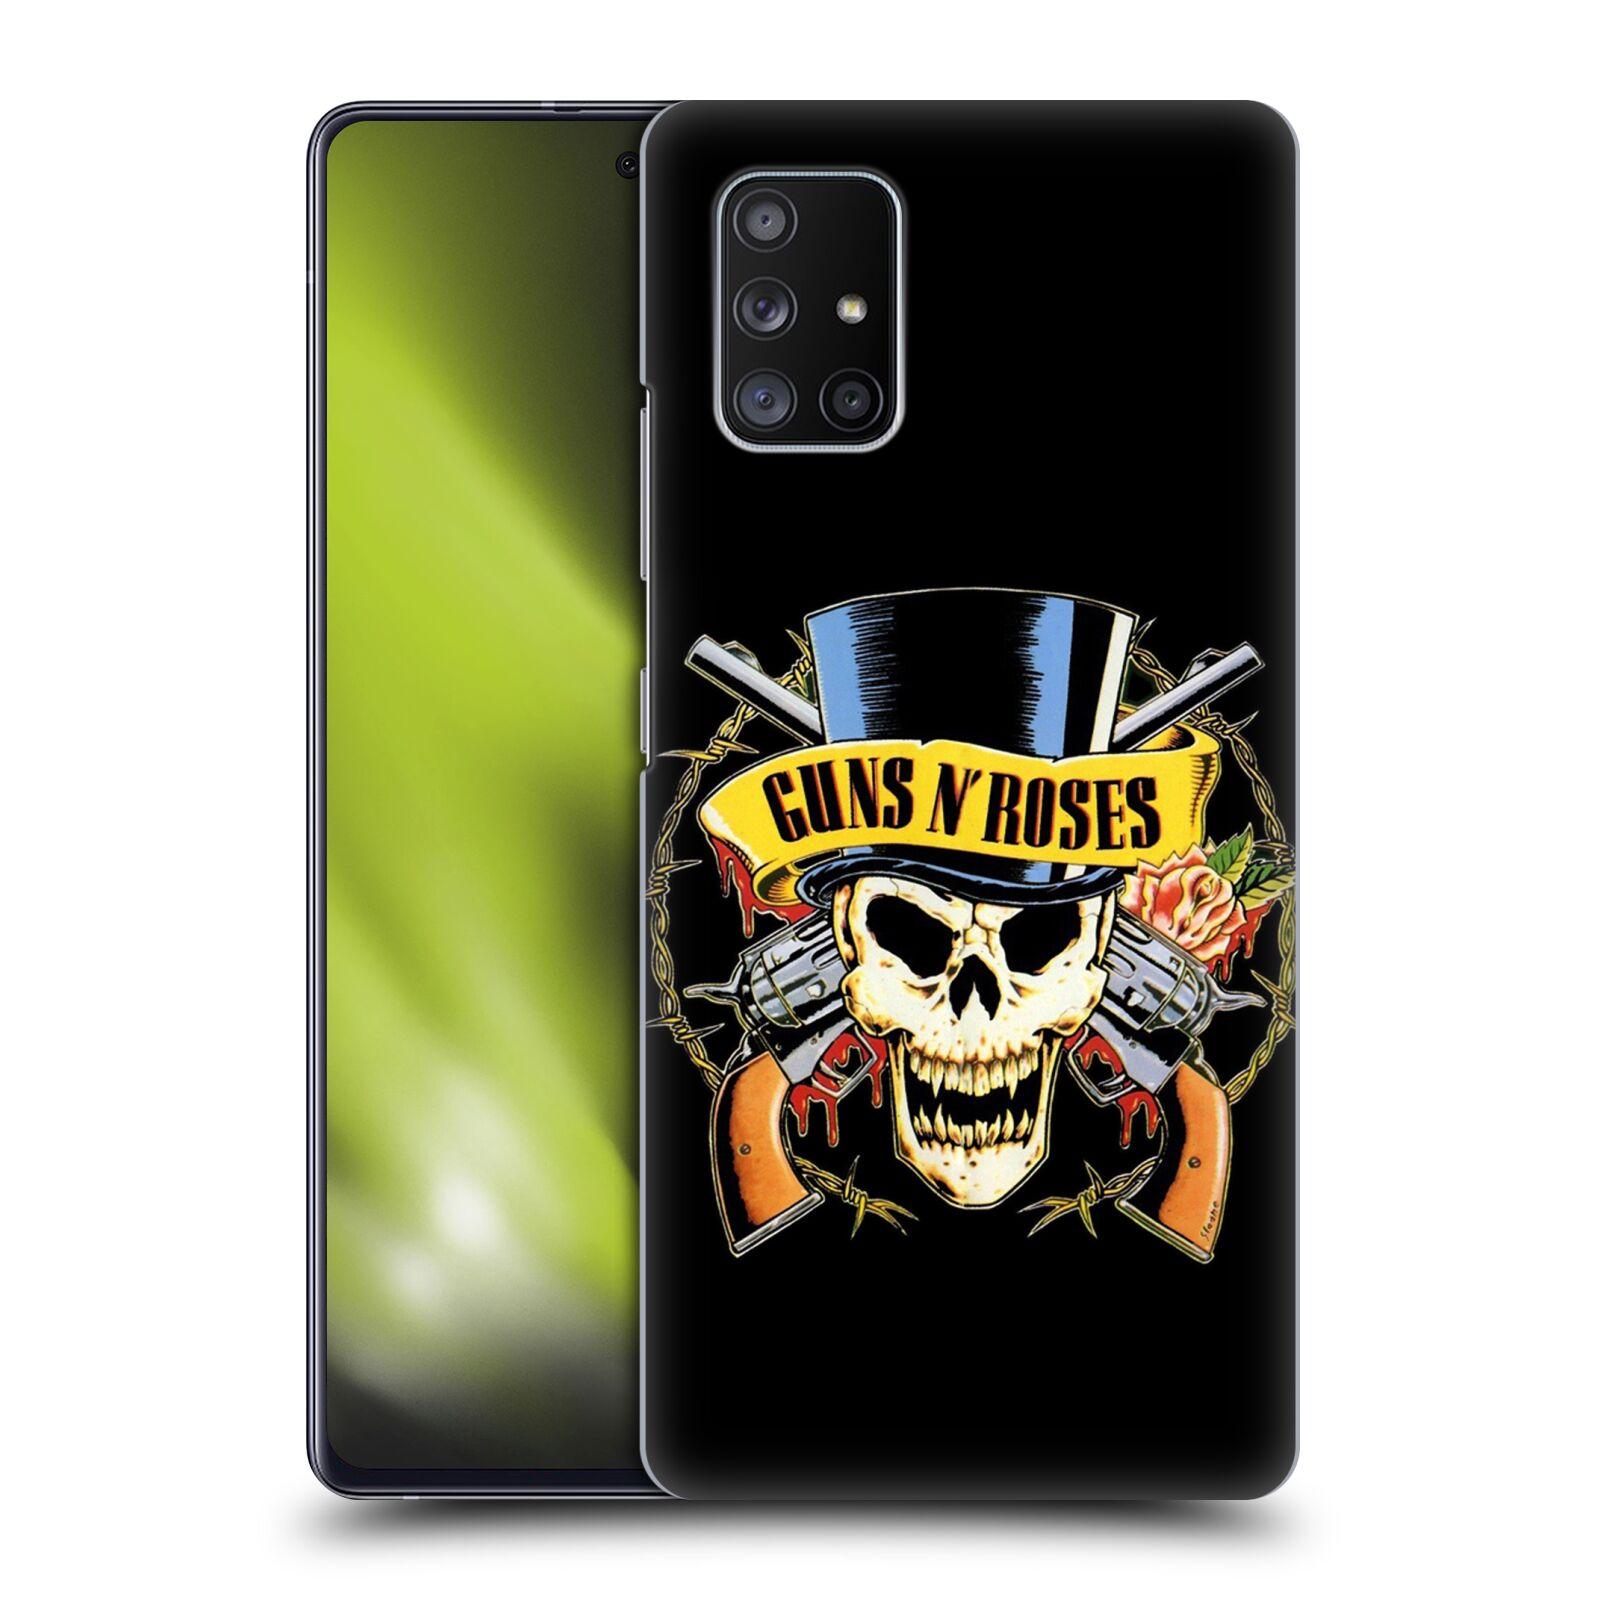 Plastové pouzdro na mobil Samsung Galaxy A51 5G - Head Case - Guns N' Roses - Lebka